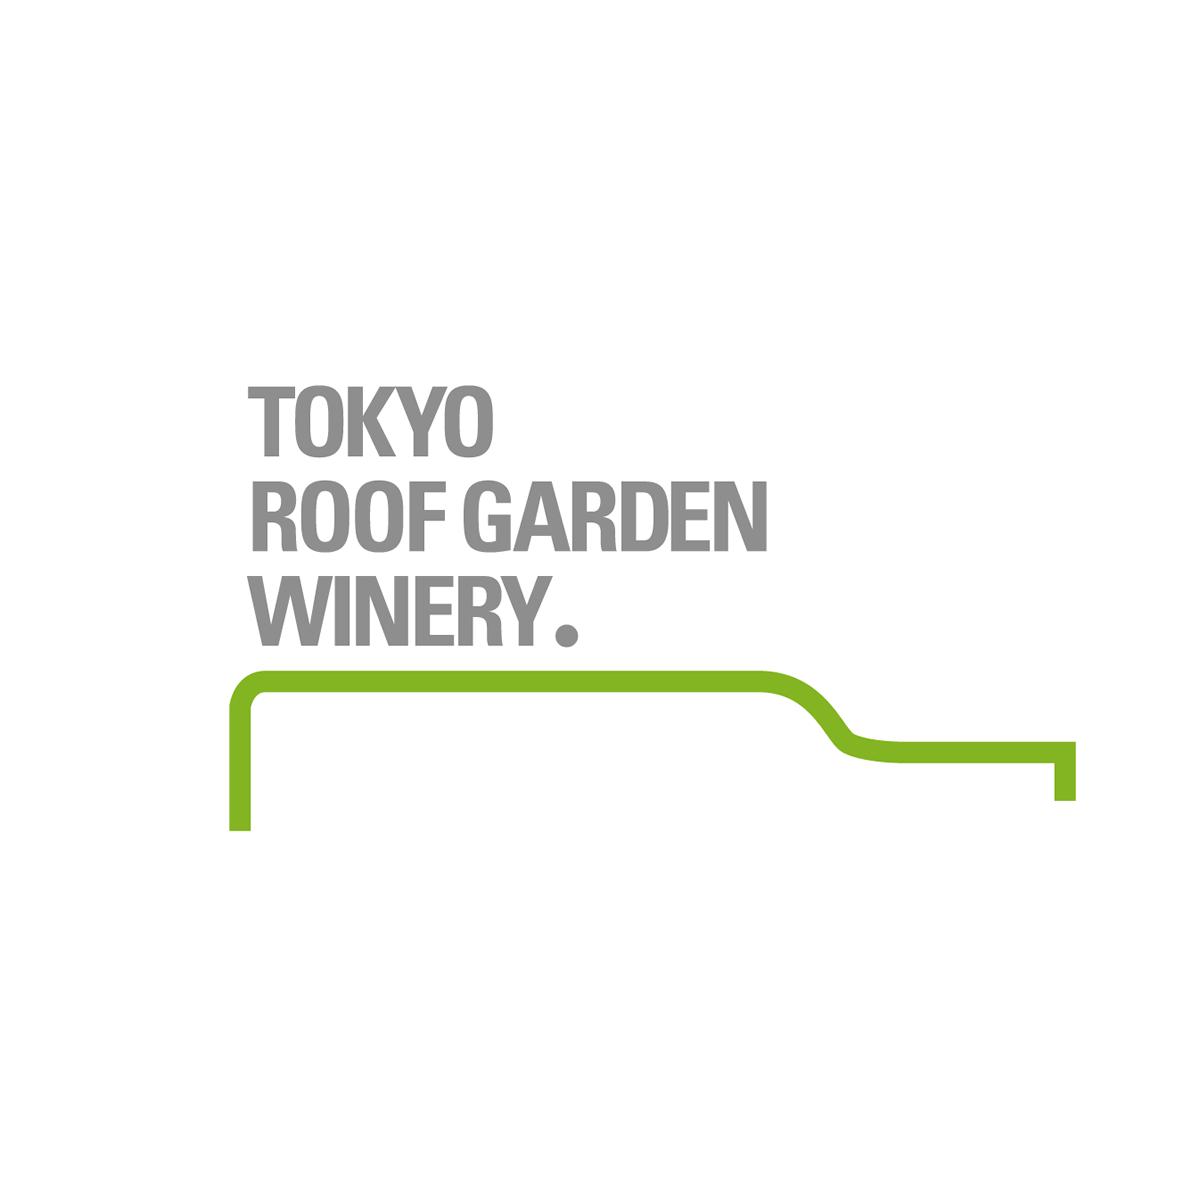 Wel's|Tokyo Roof Garden Winery 東京屋上ワイナリー計画| VIロゴデザイン|社会福祉団体|東京都千代田区